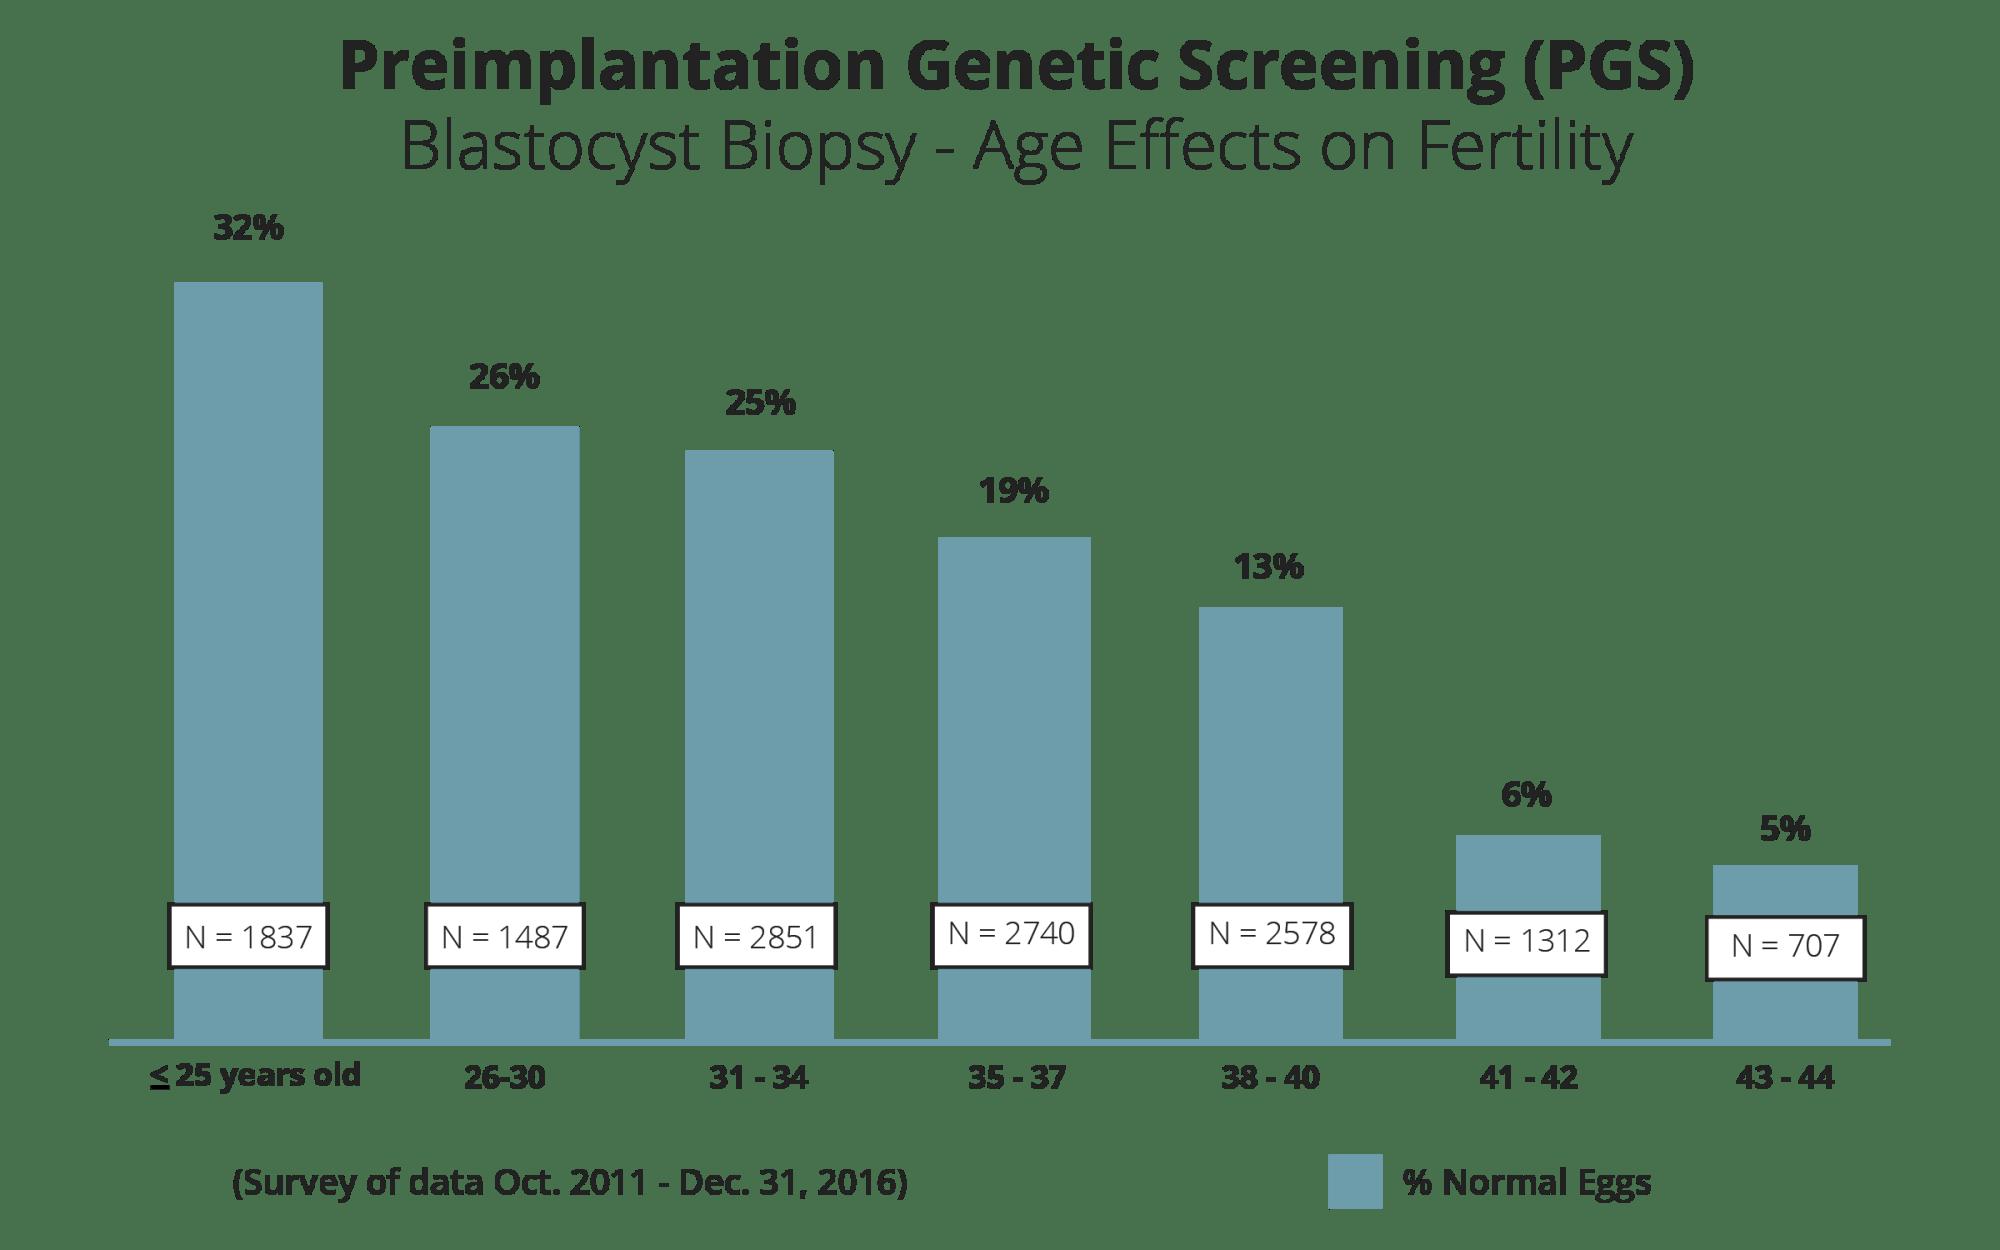 hight resolution of preimplantation genetic screening pgs blastocyst biopsy age effects on fertility